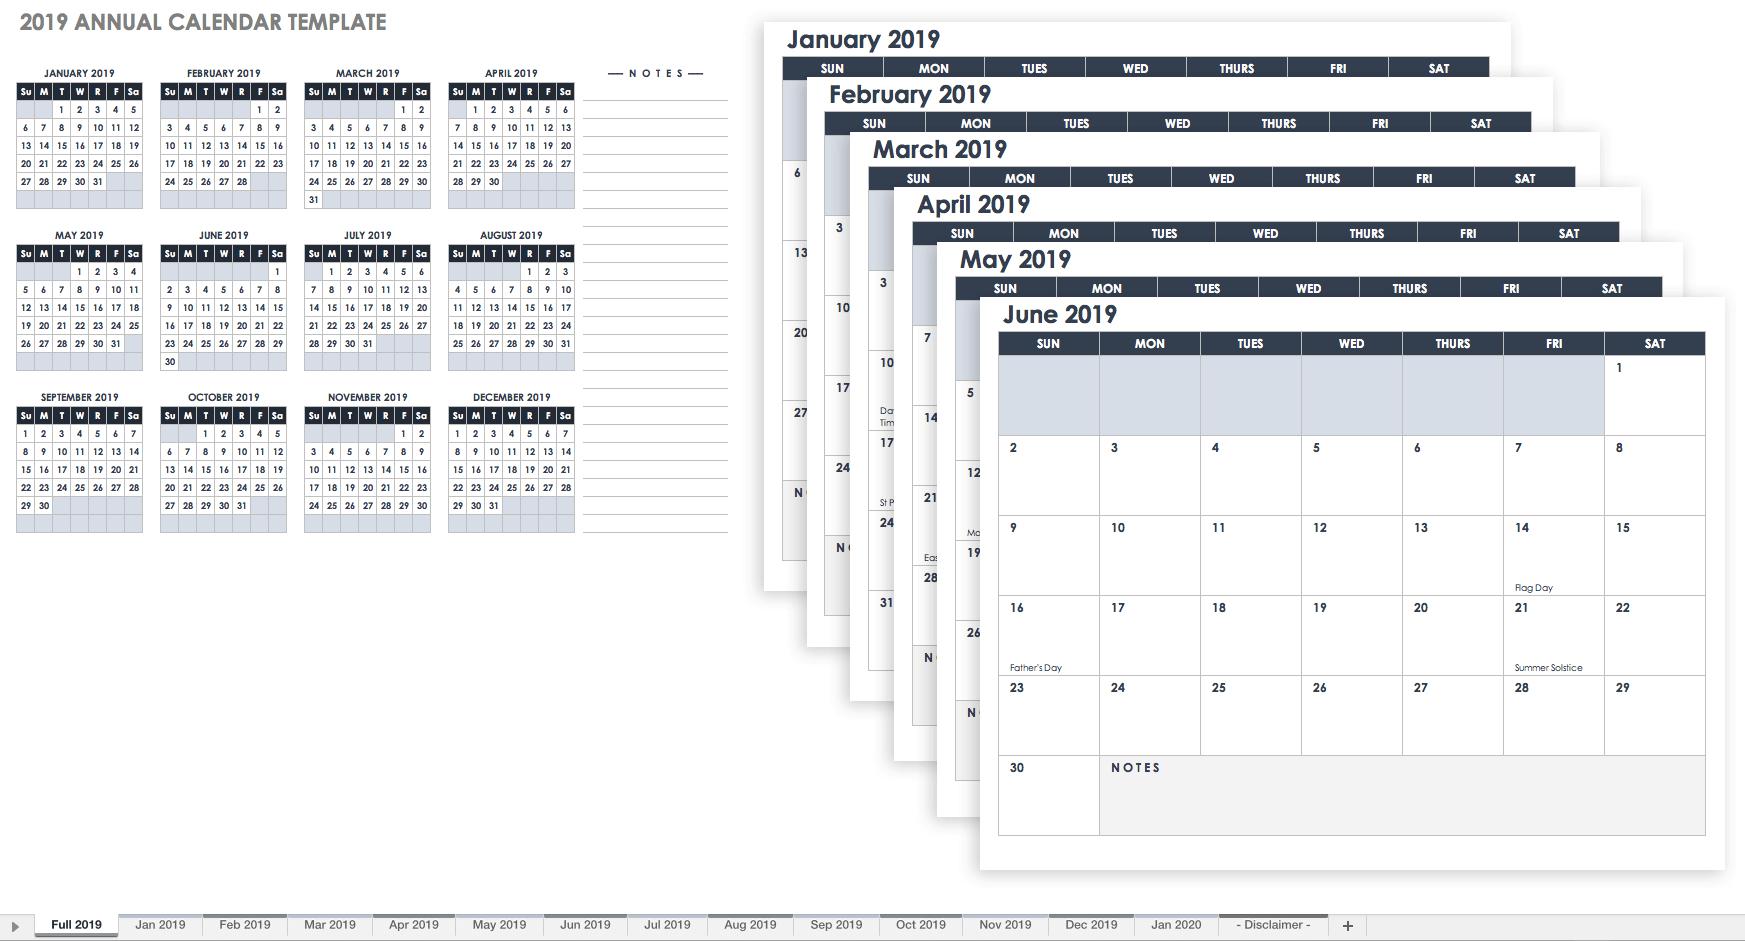 15 Free Monthly Calendar Templates | Smartsheet inside Blank Time And Date Calendar